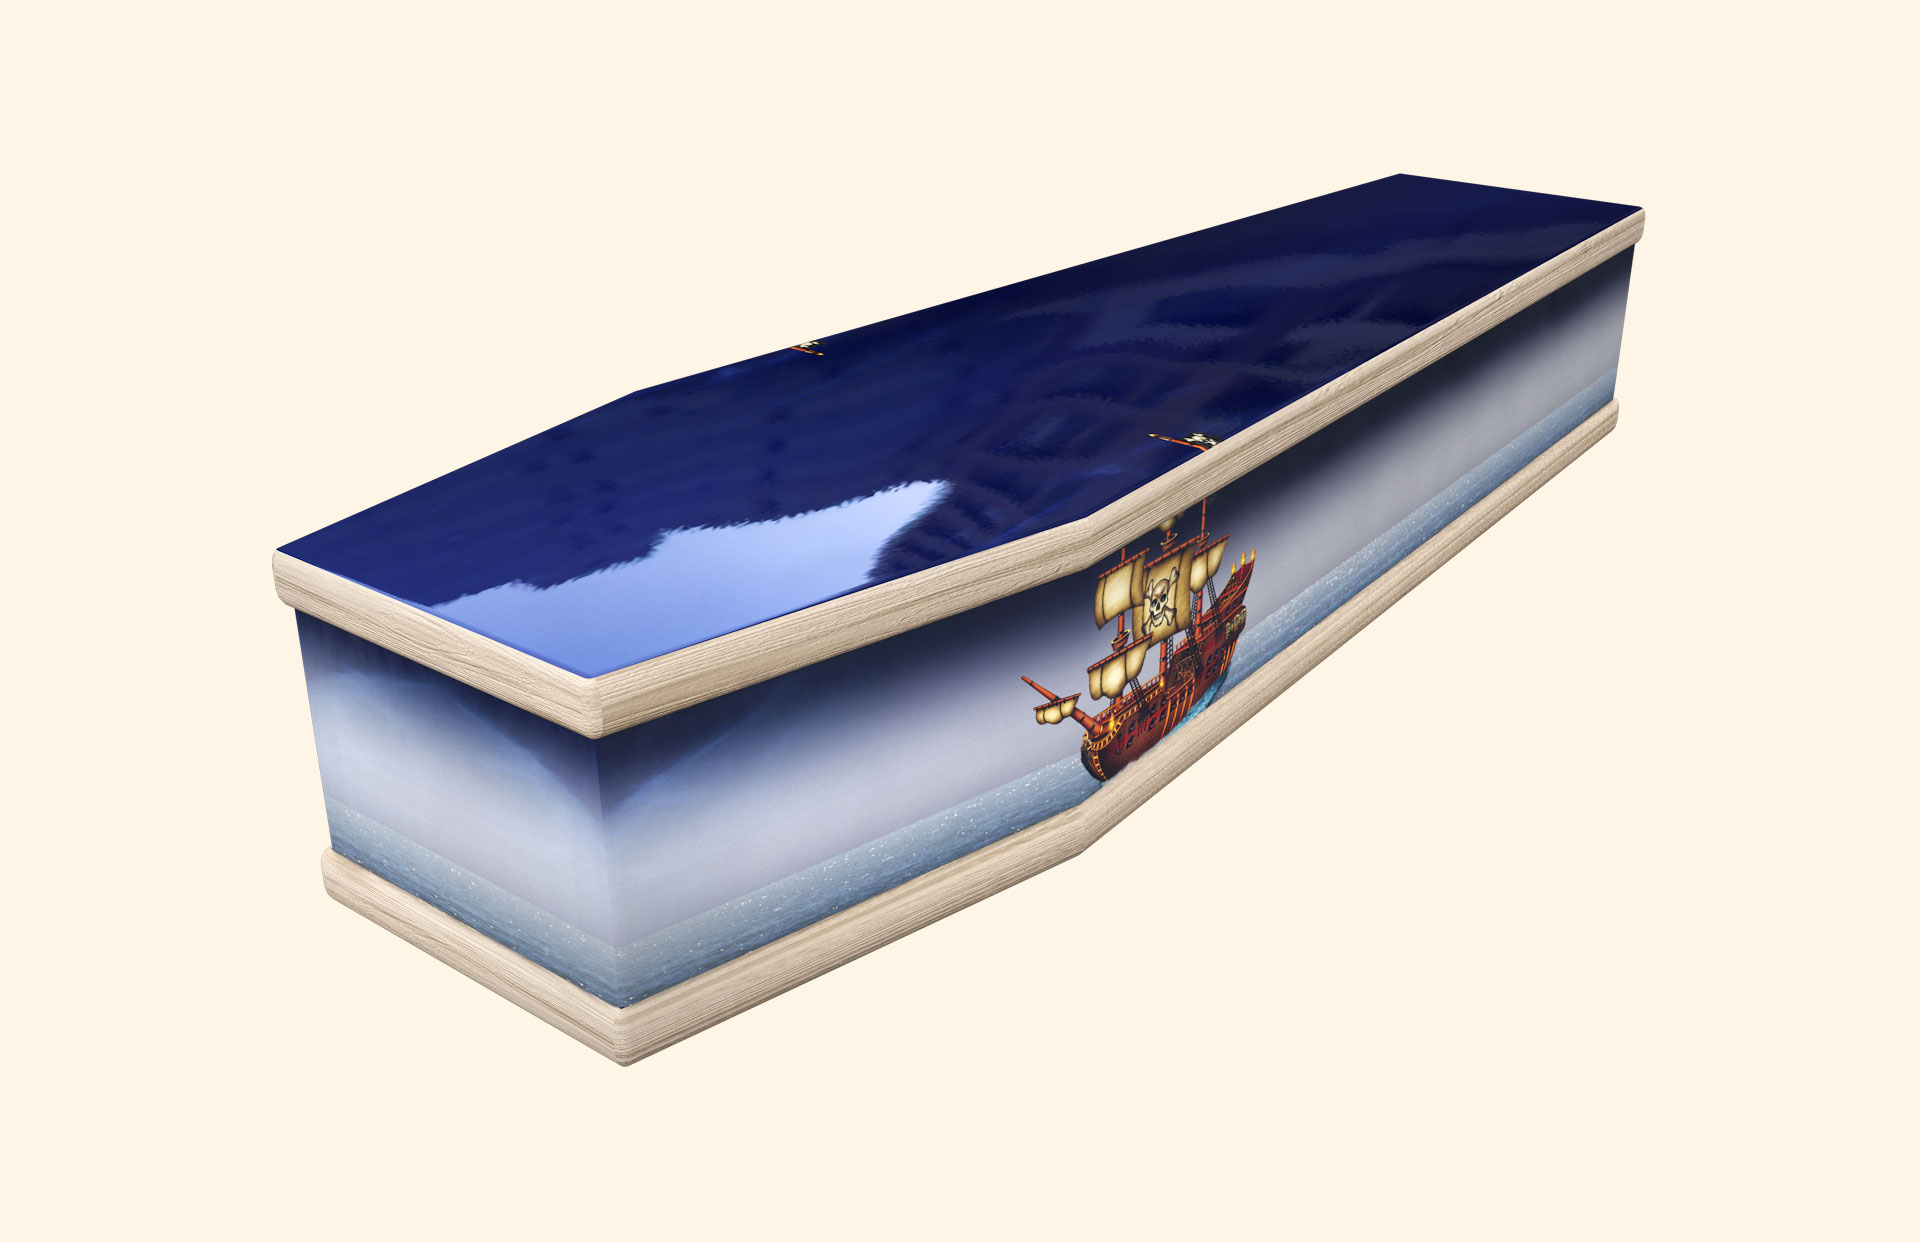 Pirate Ship Classic coffin